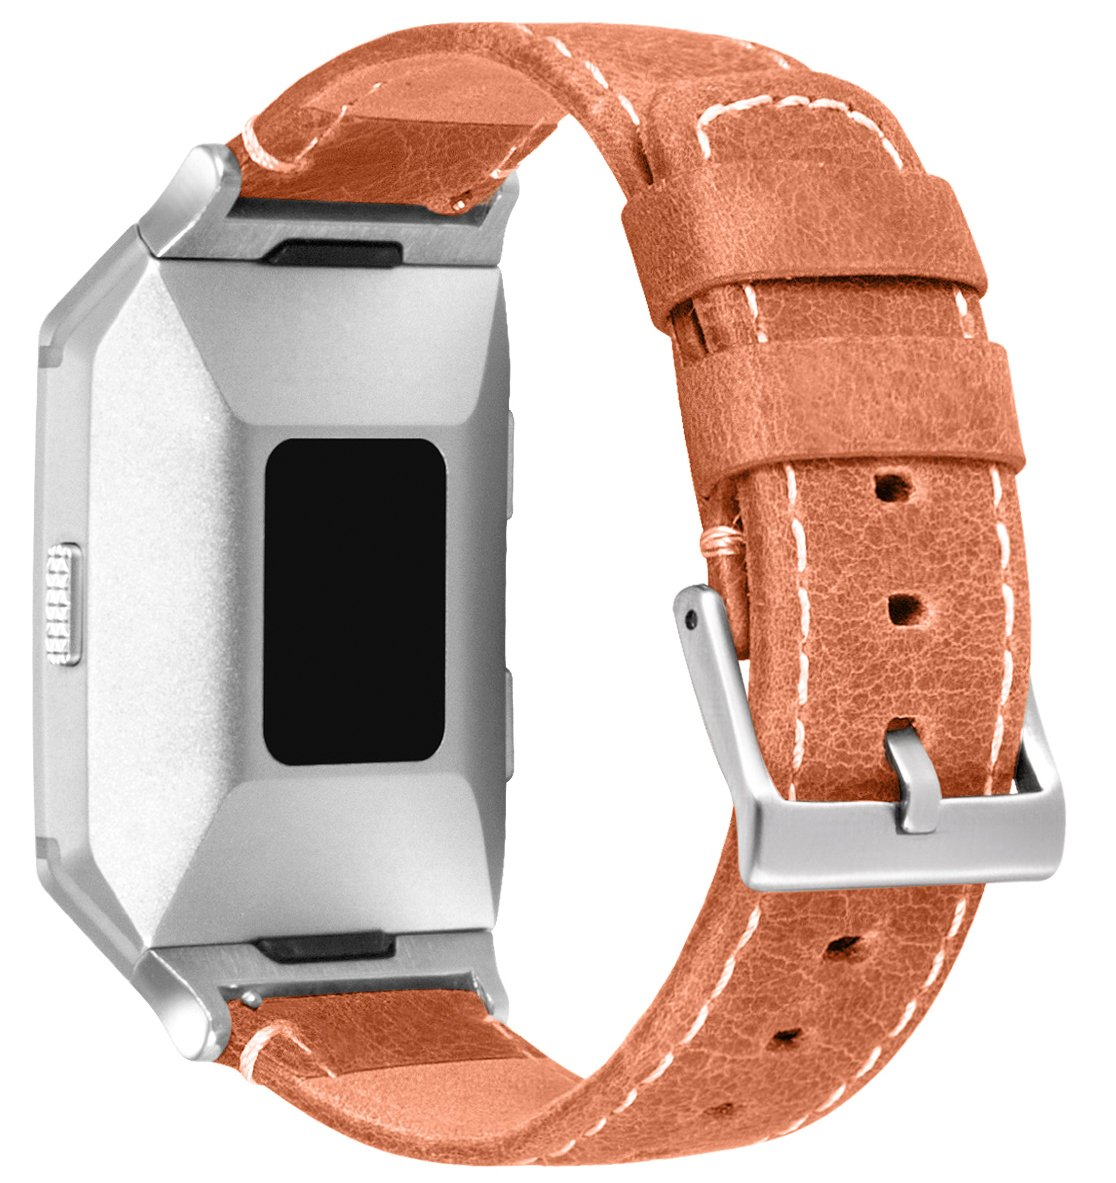 For Fitbit Ionic帯、treasuremax Genuineレザー交換用バンドアクセサリーfor Fitbit Ionic Smartwatch Staps Standard(5.5